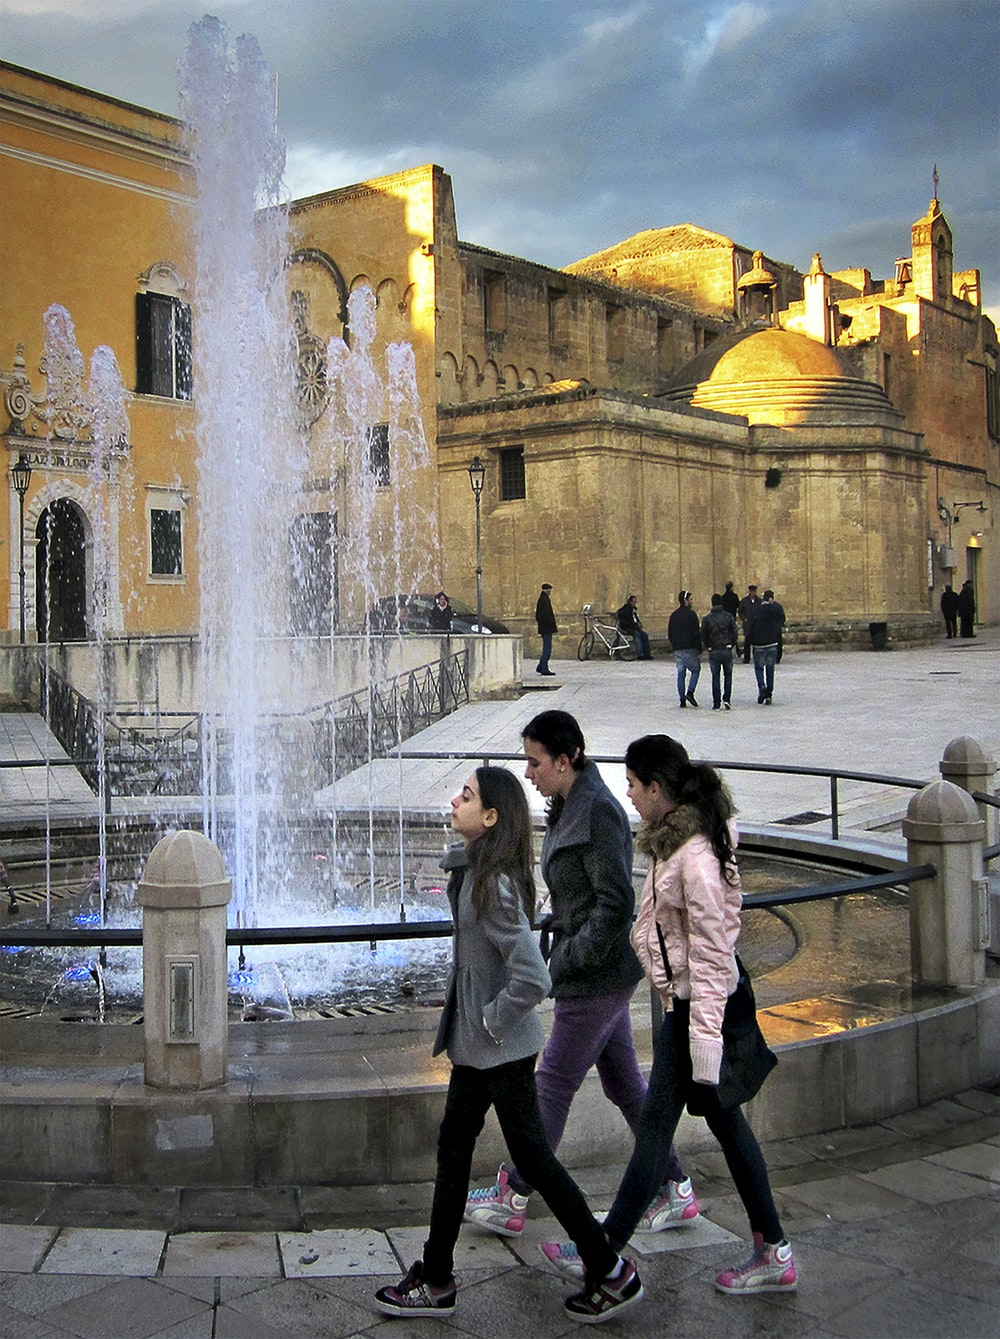 woman in gray coat standing near fountain